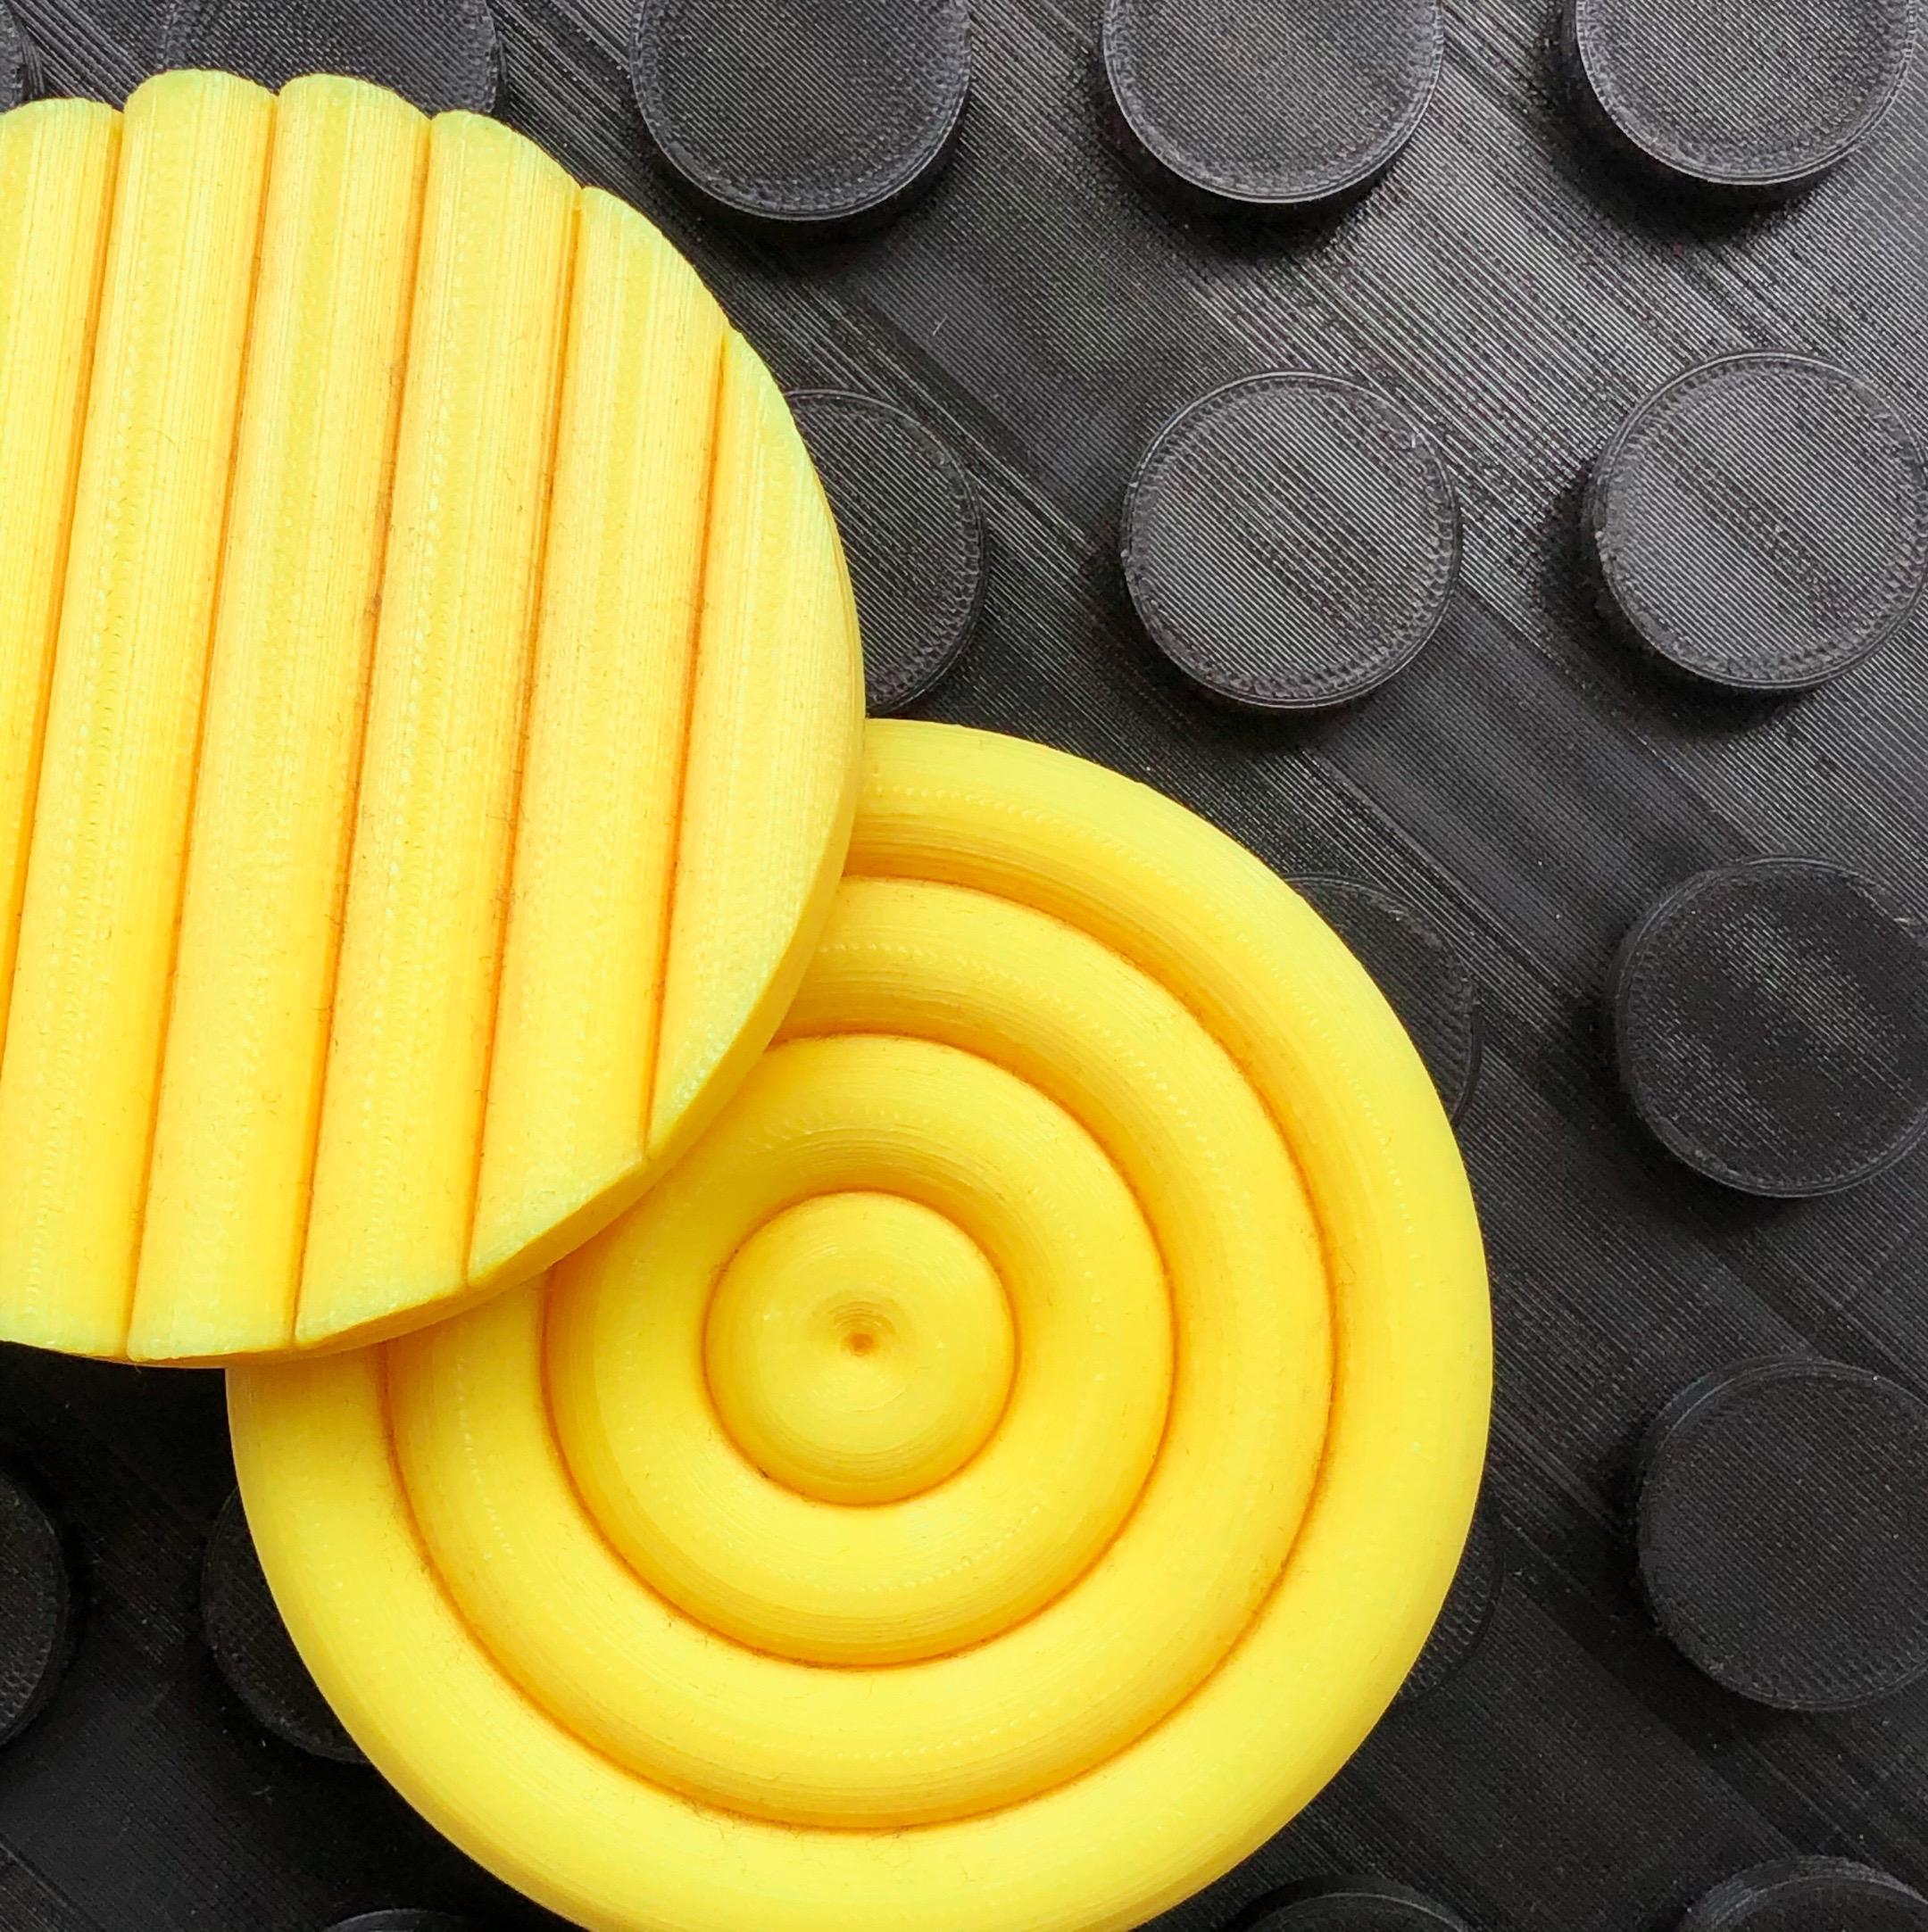 Makelab - 3D Printing Services - PLA Textures